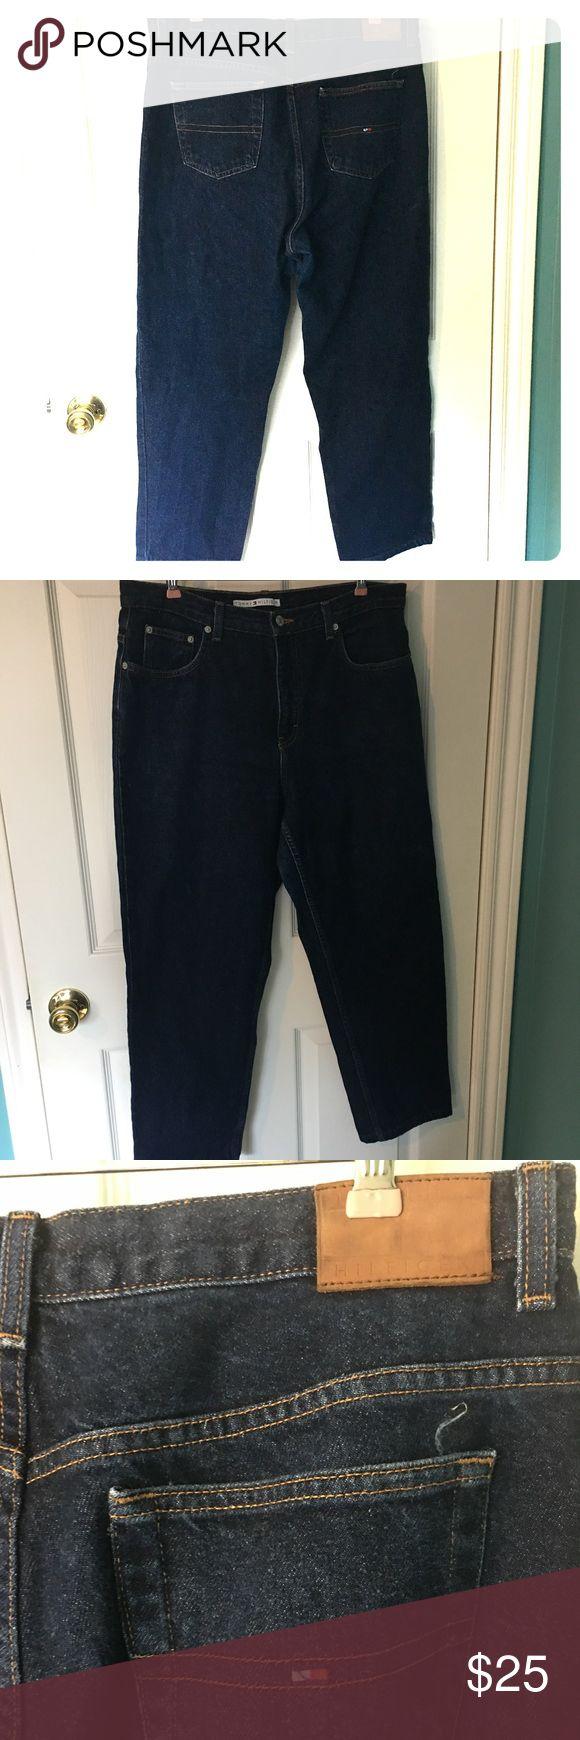 "Tommy Hilfiger Jeans 33 x 27.75"" Waist 16.5"" across. Inseam 27.75"", rise 12"". I can't tell if they're men's or women's so I'm listing as women's Tommy Hilfiger Jeans Straight Leg"